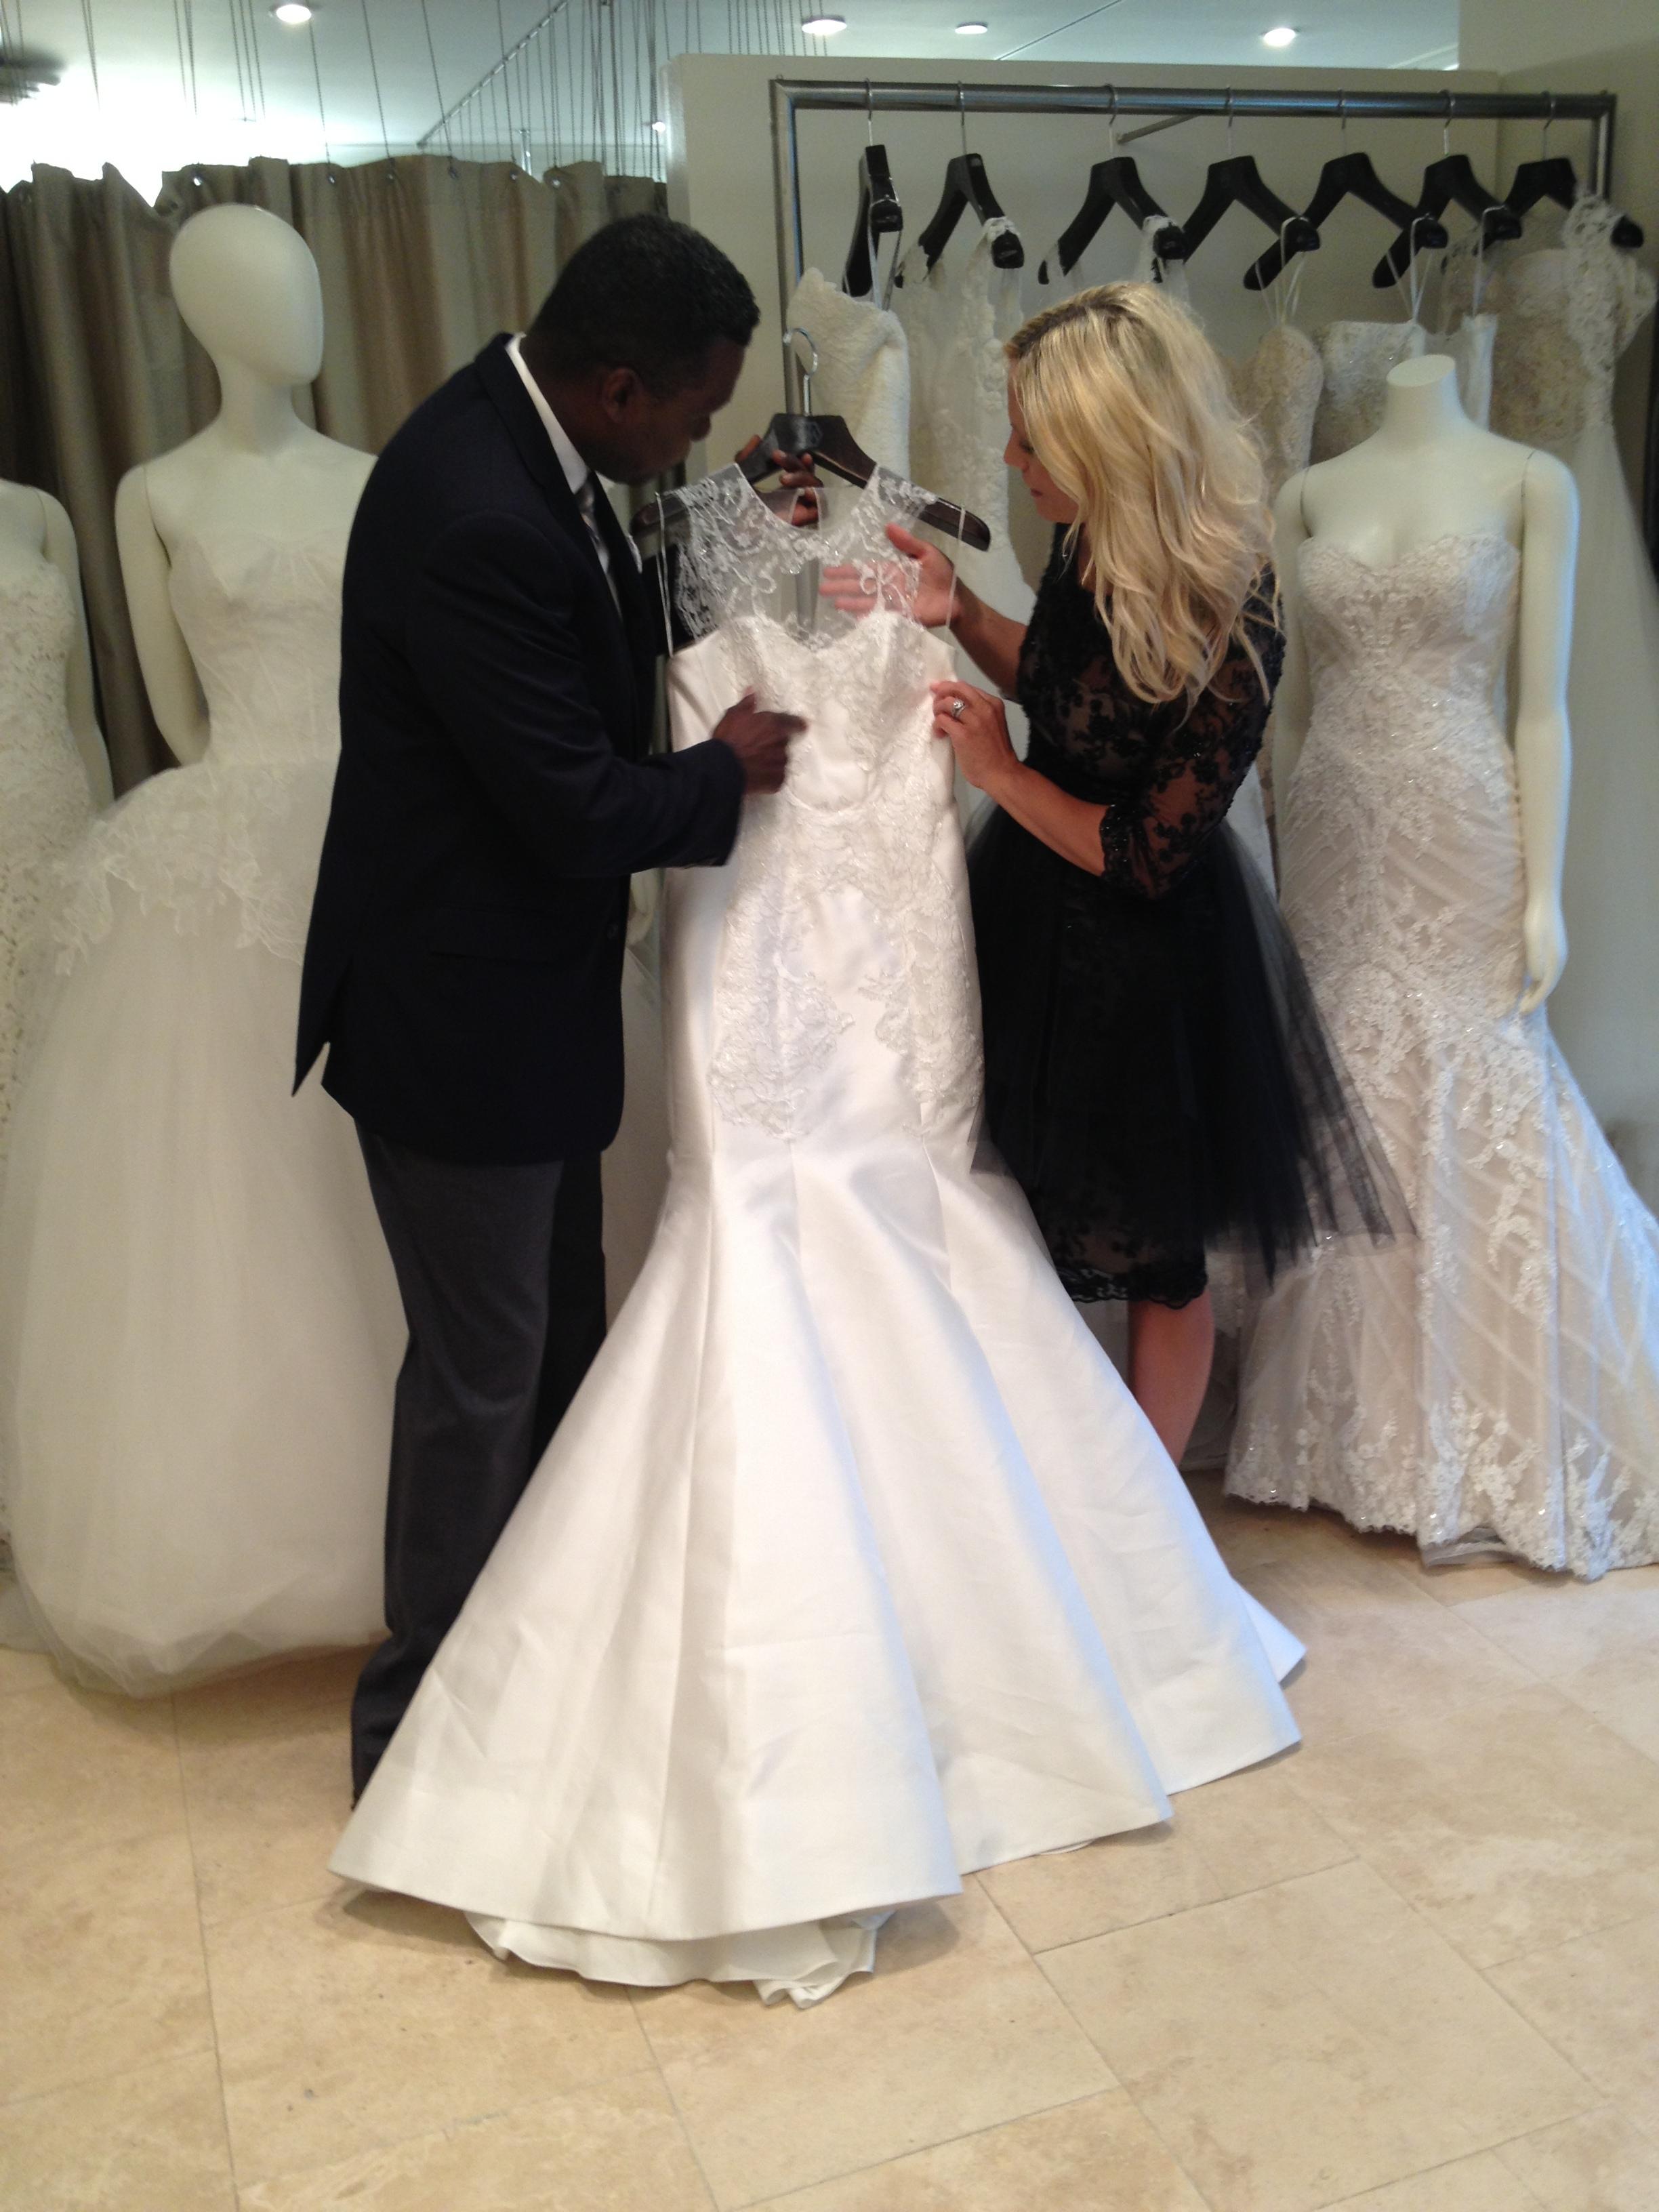 Ceci_New_York_Ceci_Style_Ceci_Johnson_Luxury_Lifestyle_Floral_Lace_Wedding_Letterpress_Inspiration_Design_Custom_Couture_Personalized_Invitations_8.jpg